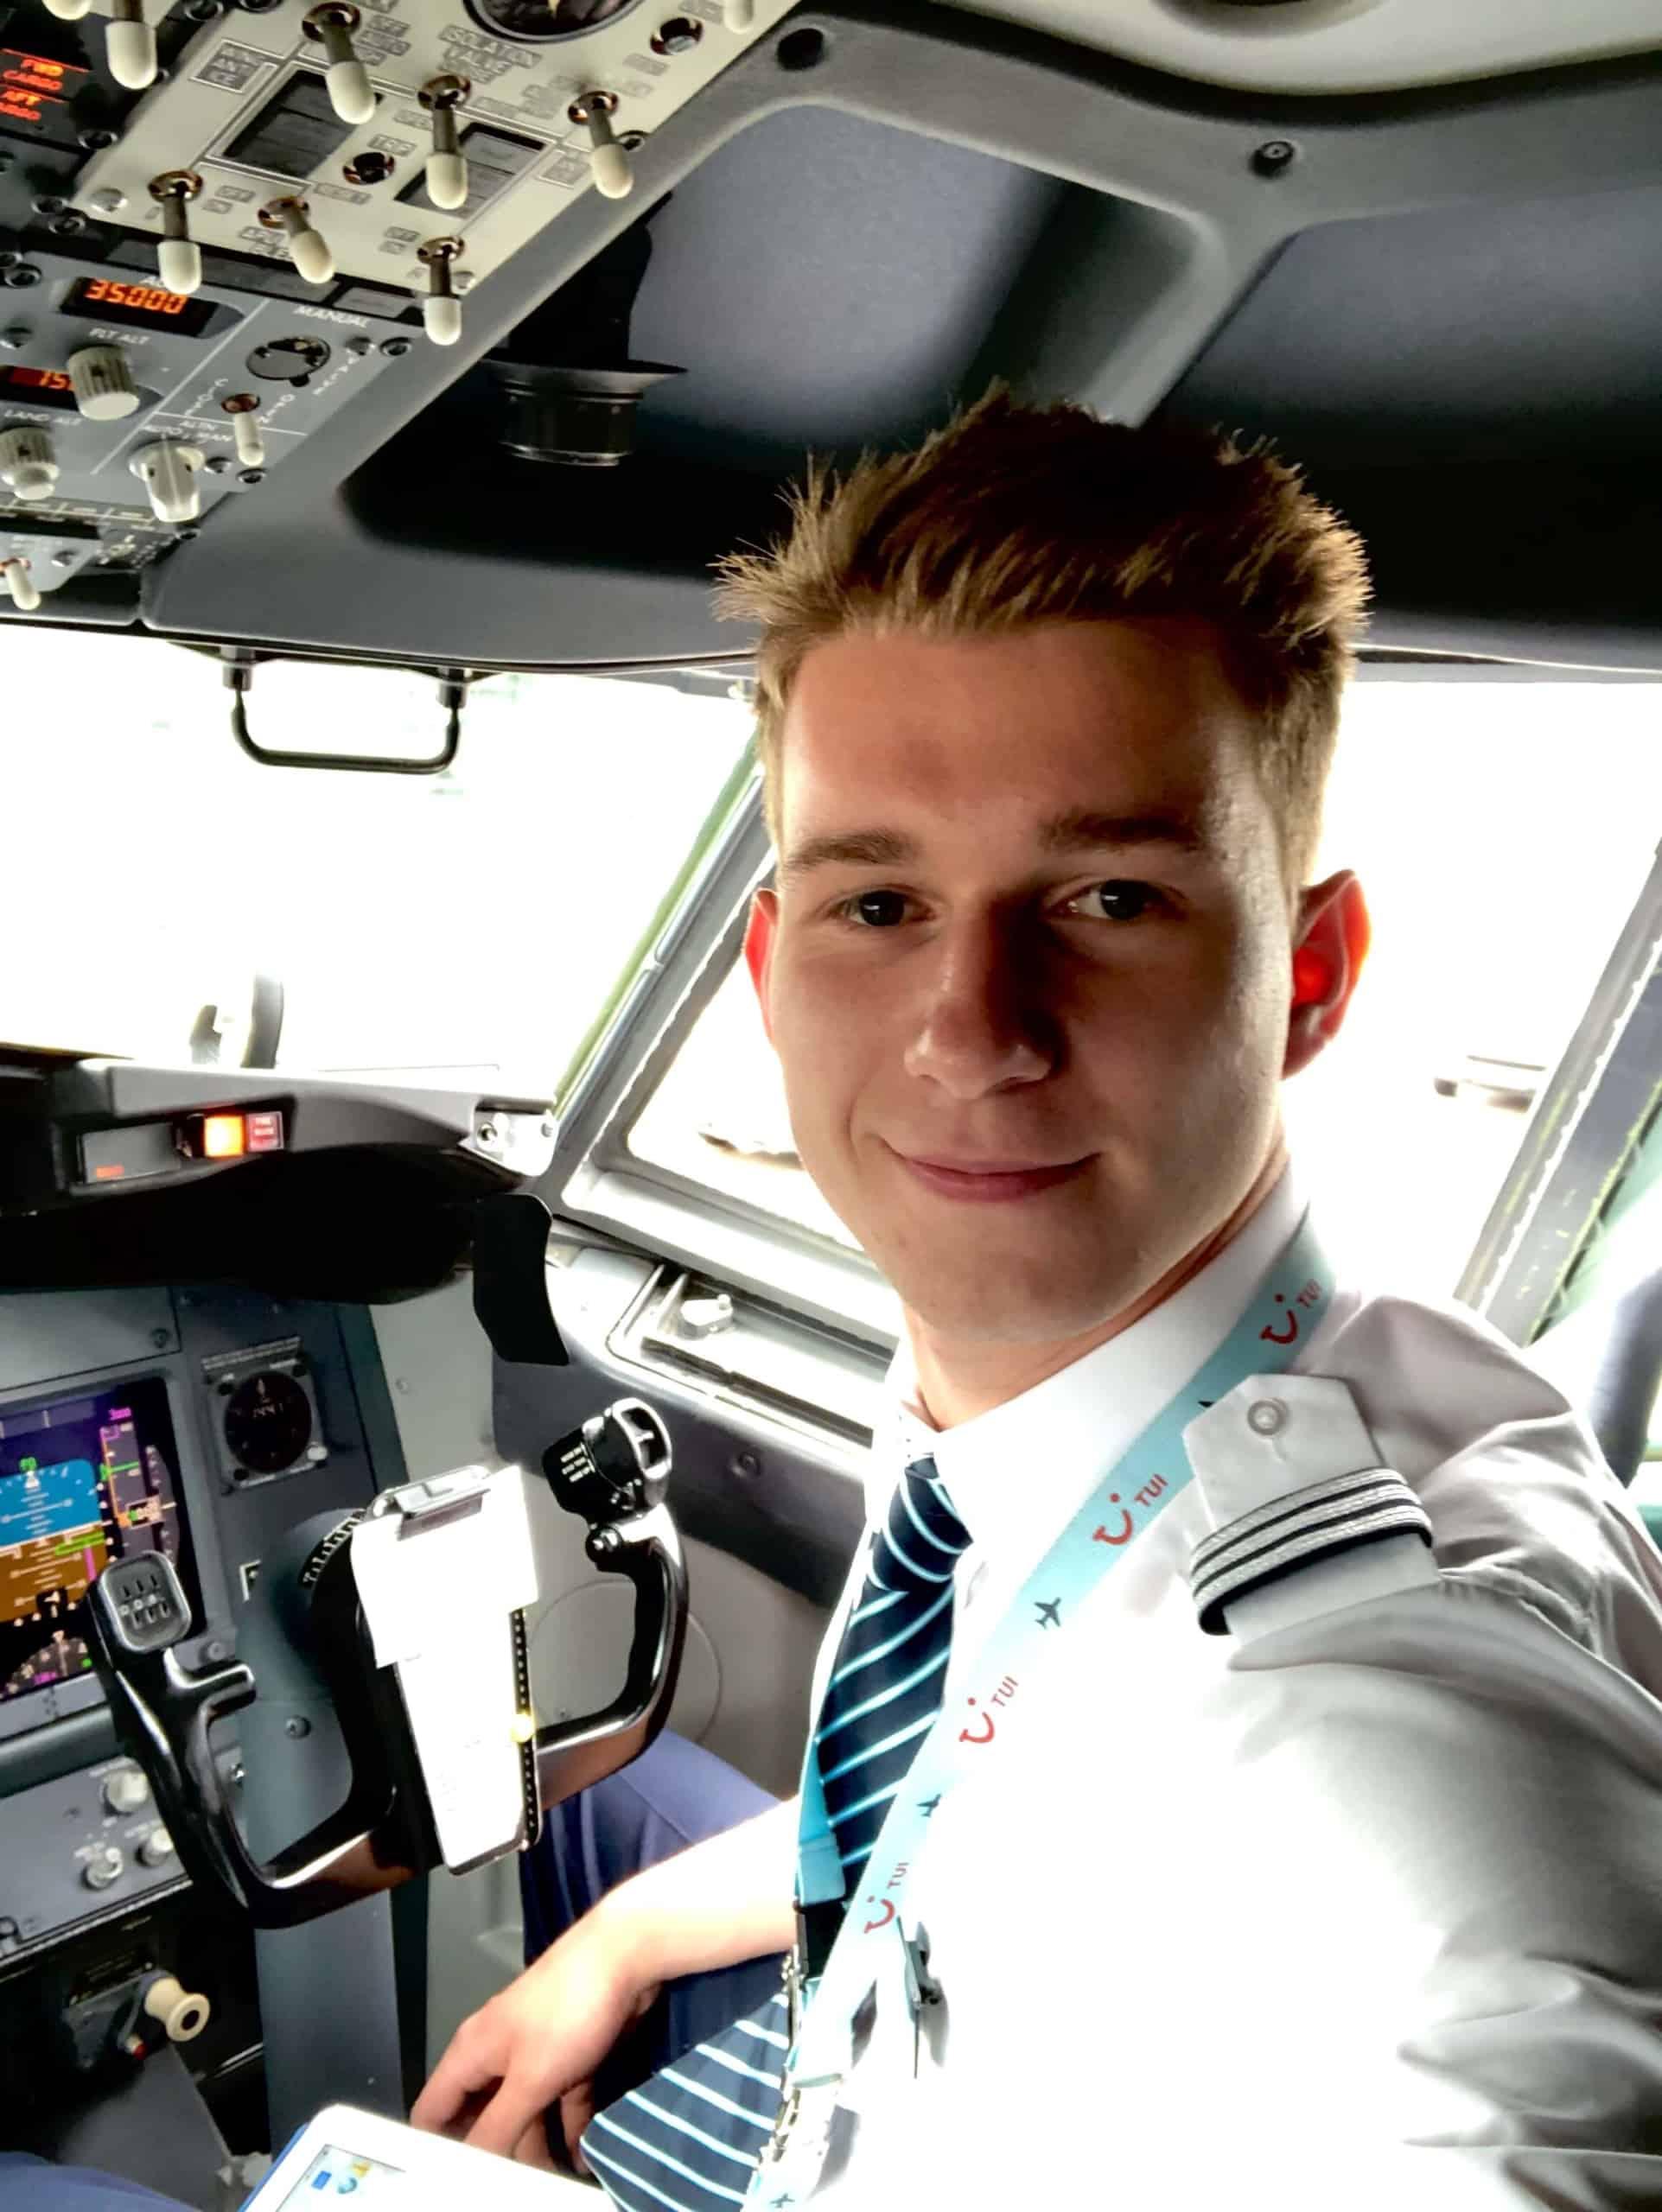 Dustin Pilot, First Officer Profil @_dustin_737